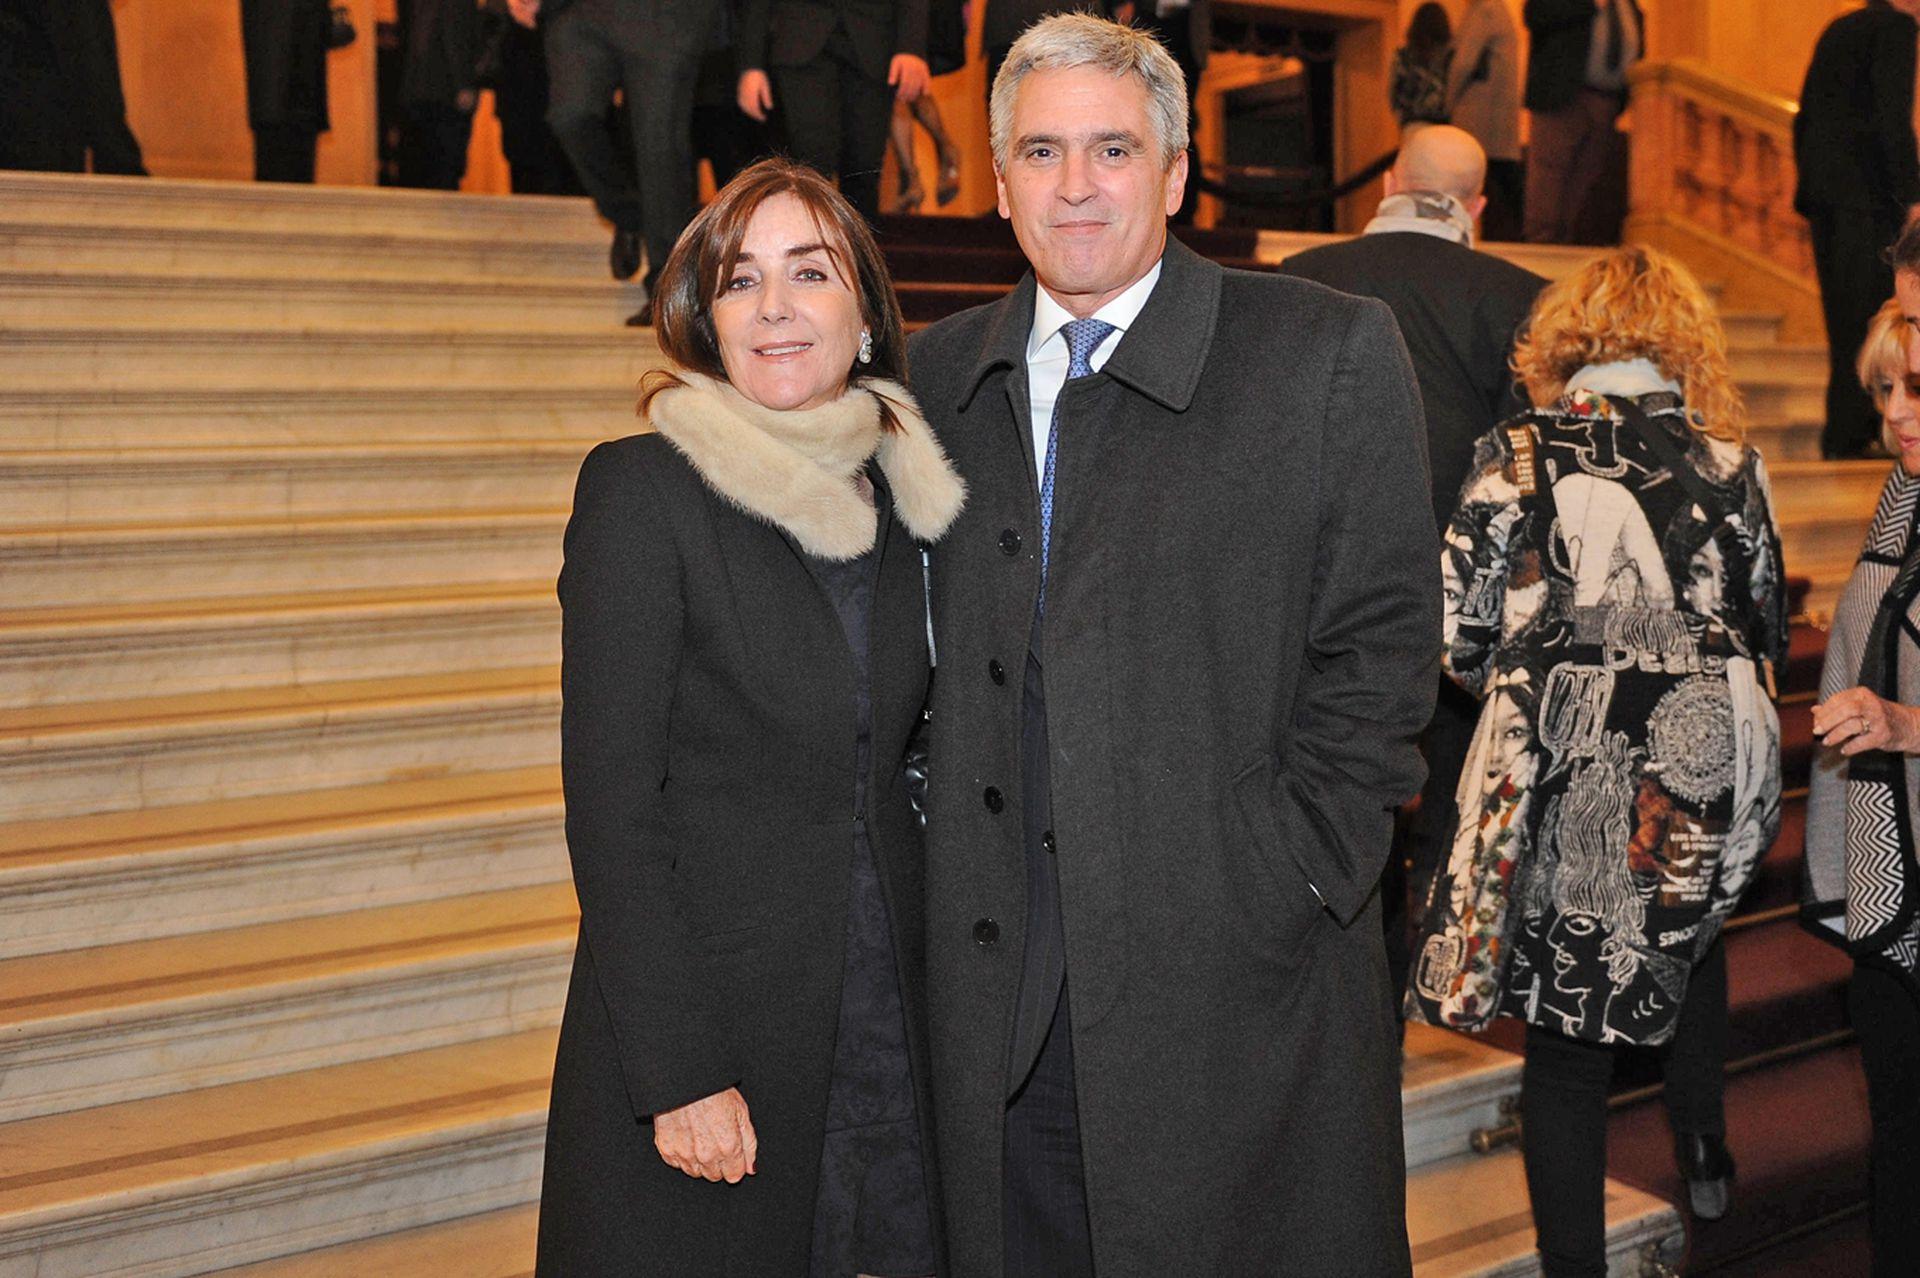 El embajador de Perú en Argentina, Peter Camino Cannock junto a su esposa, al llegar a la gala